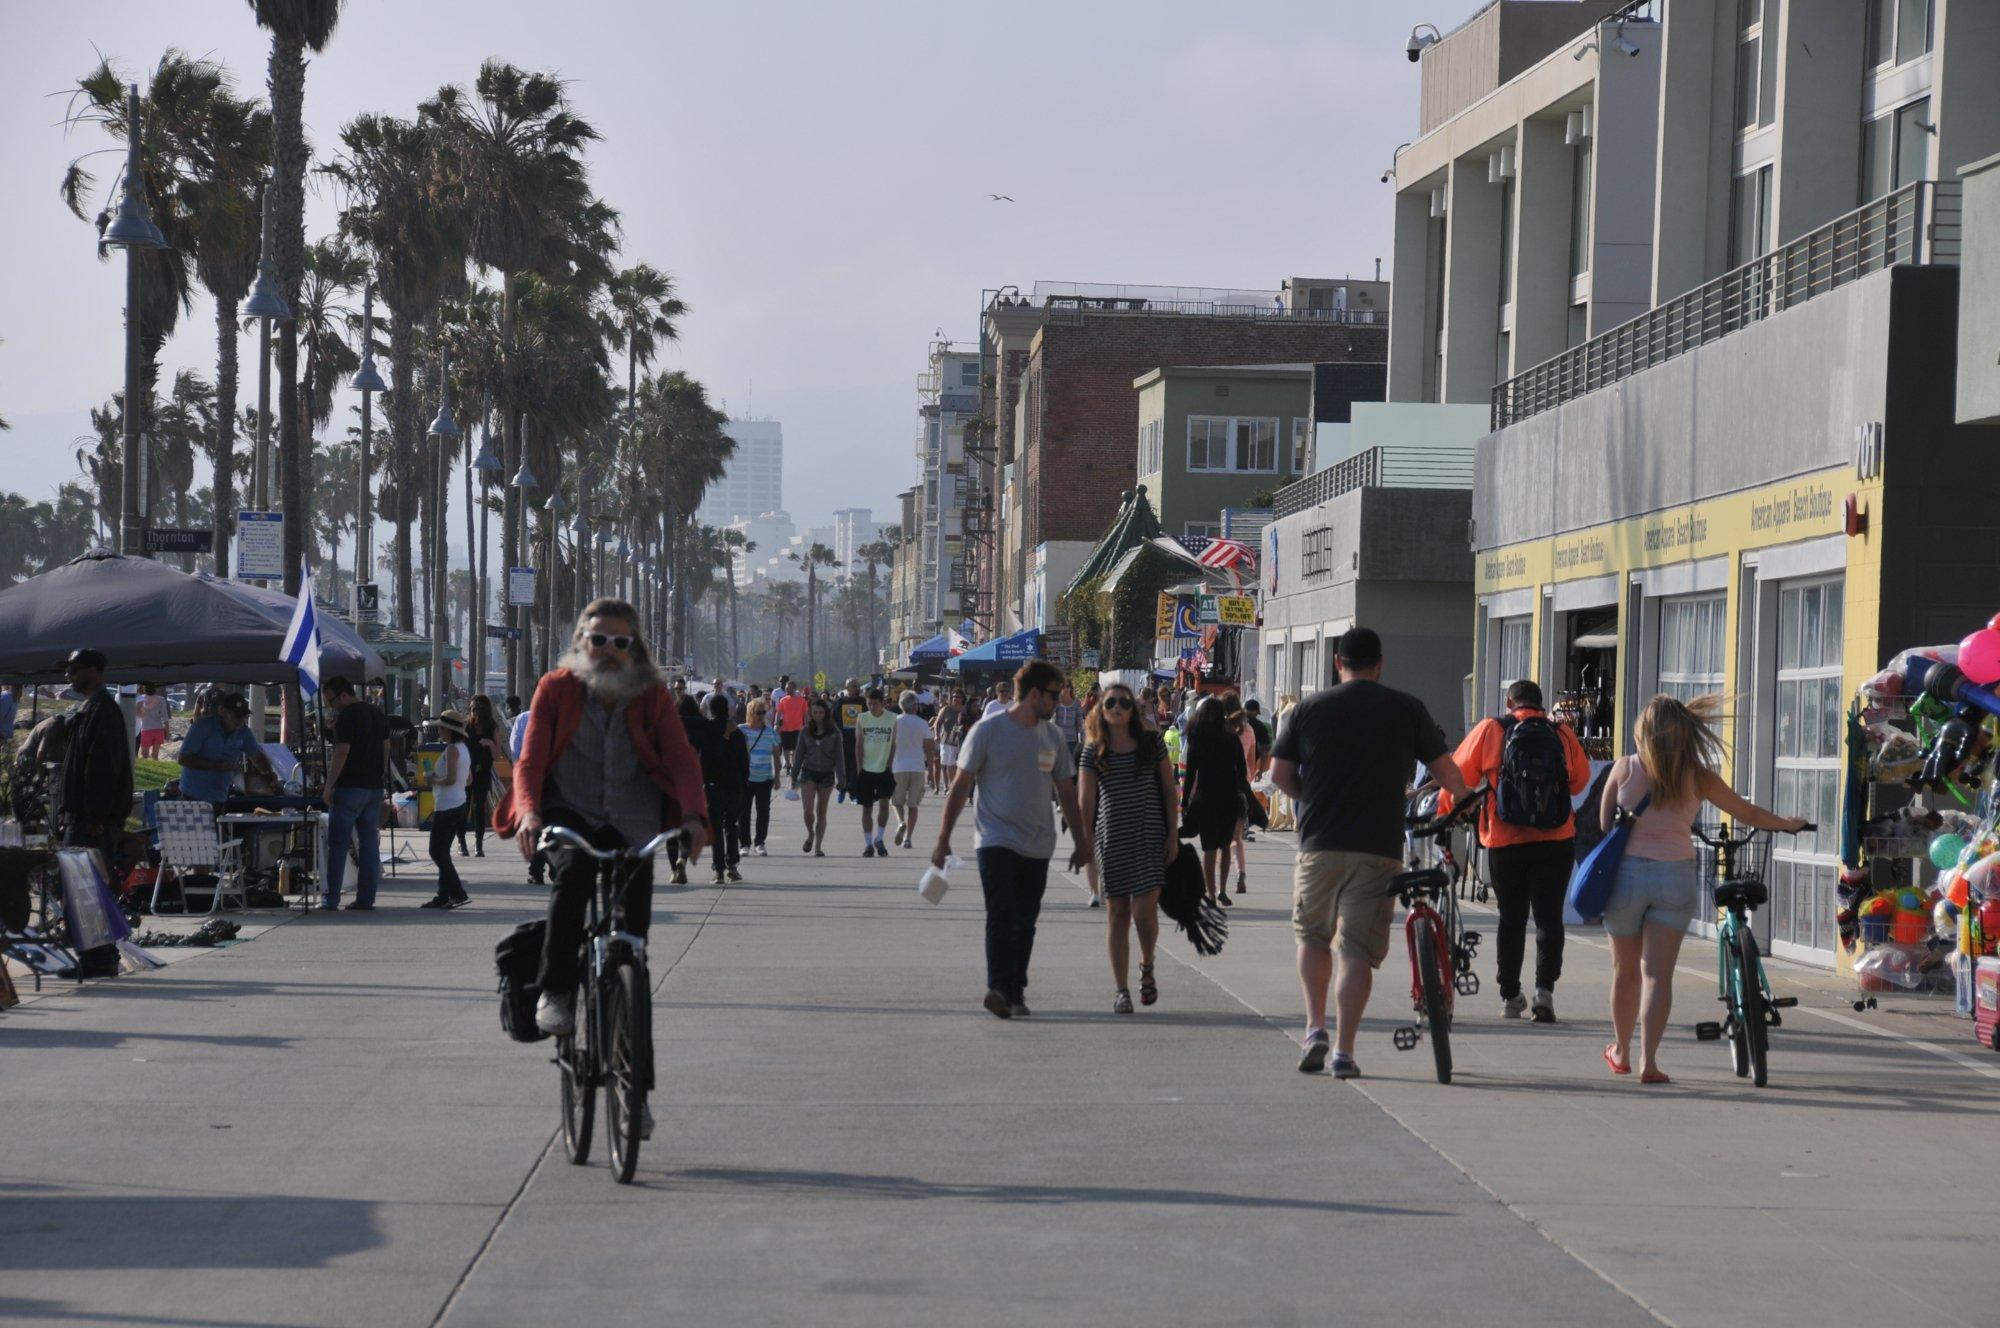 Venice Beach, Los Angeles, CA